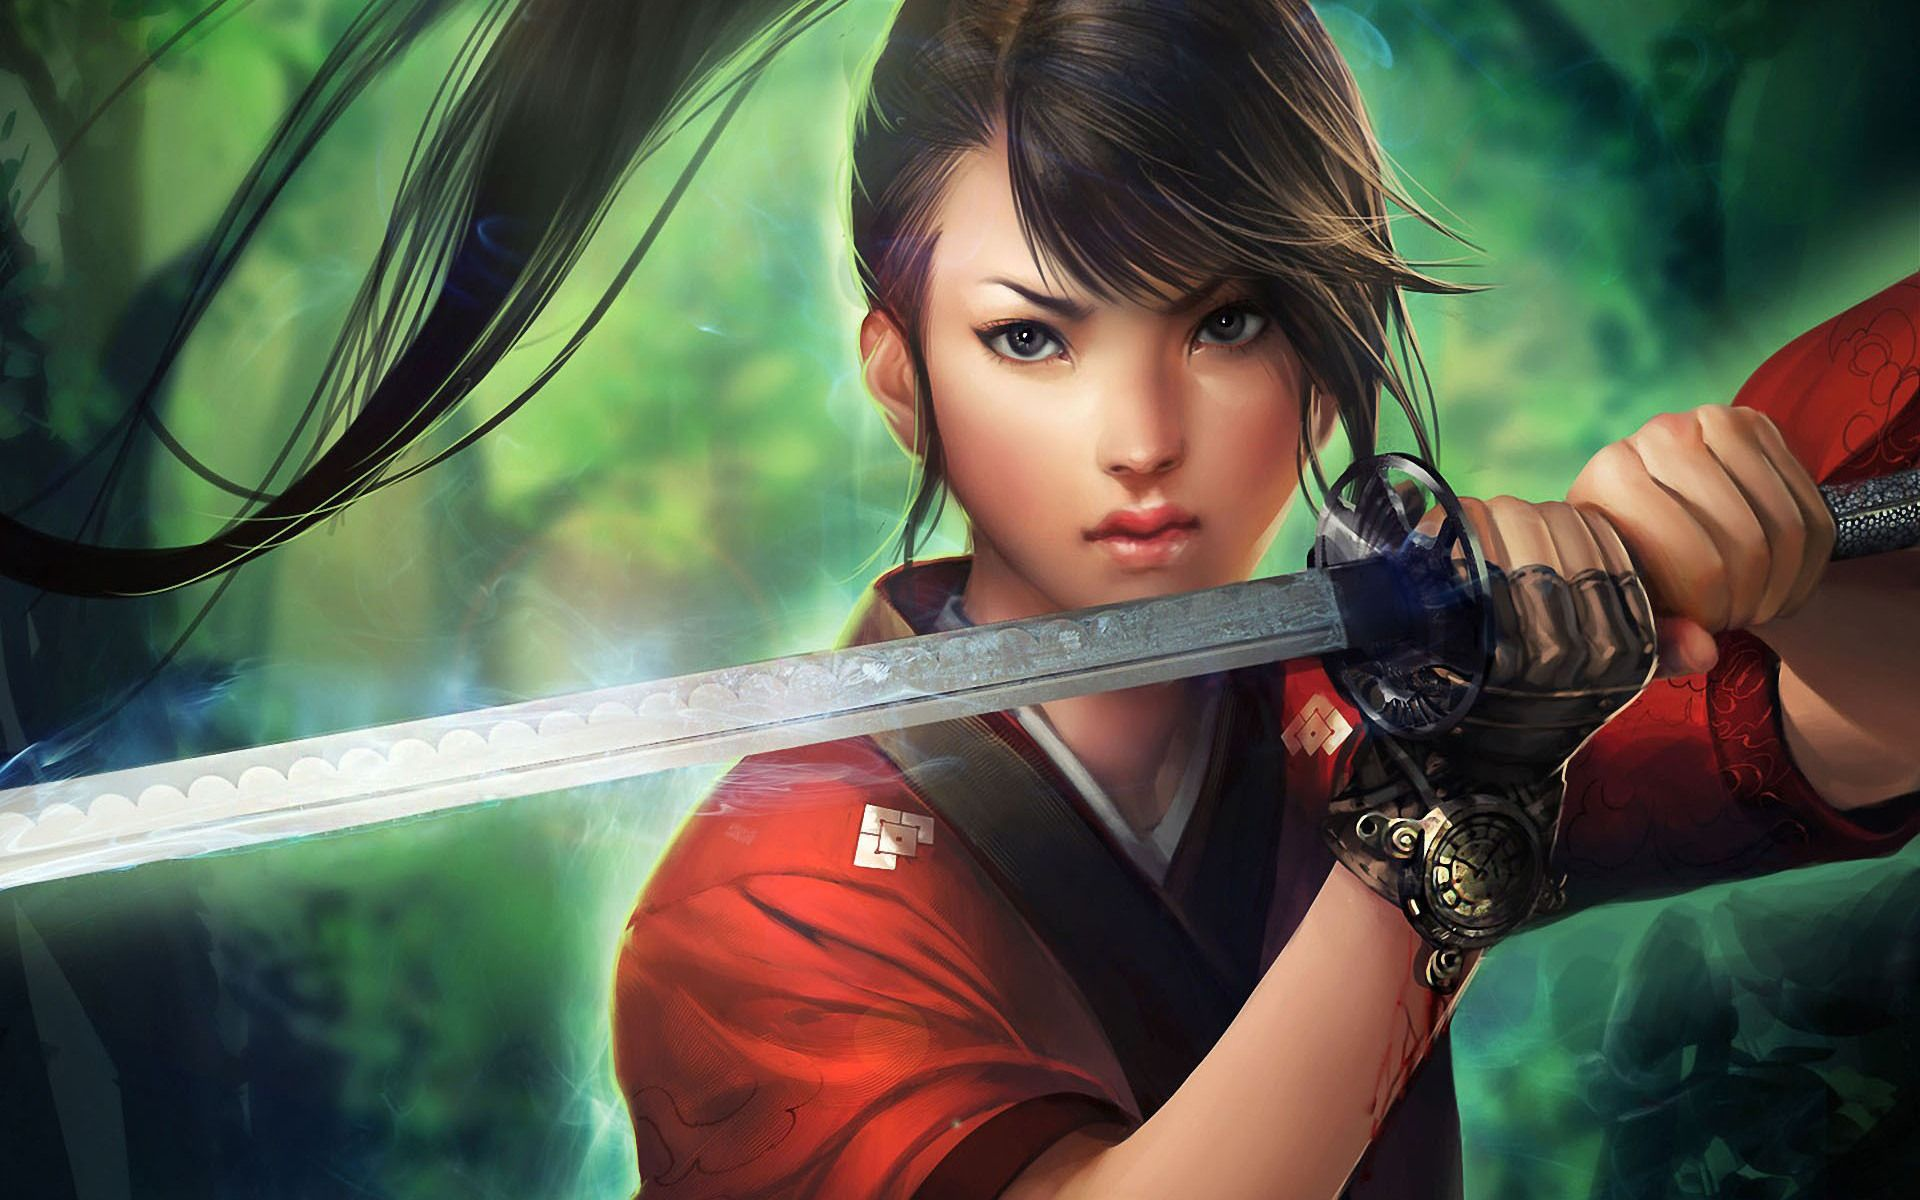 Swordswoman Warrior Woman Female Warrior Art Warriors Wallpaper